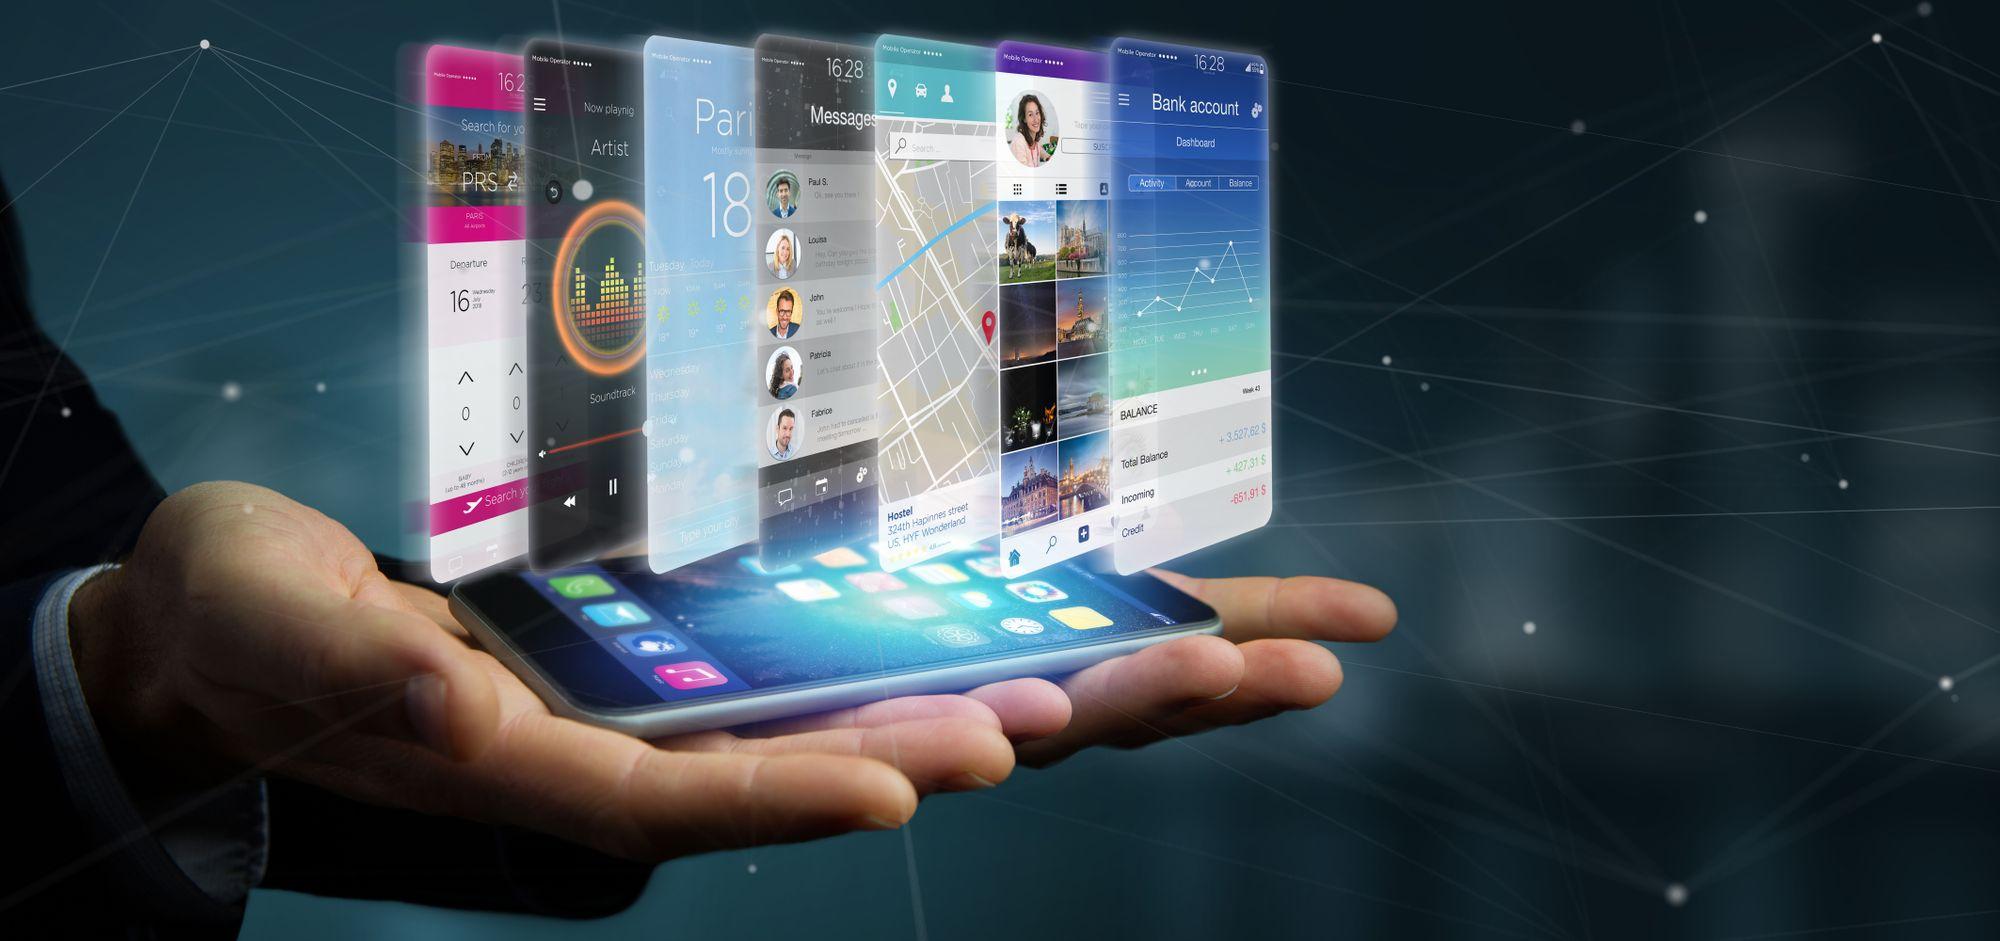 mobile app deployment phase